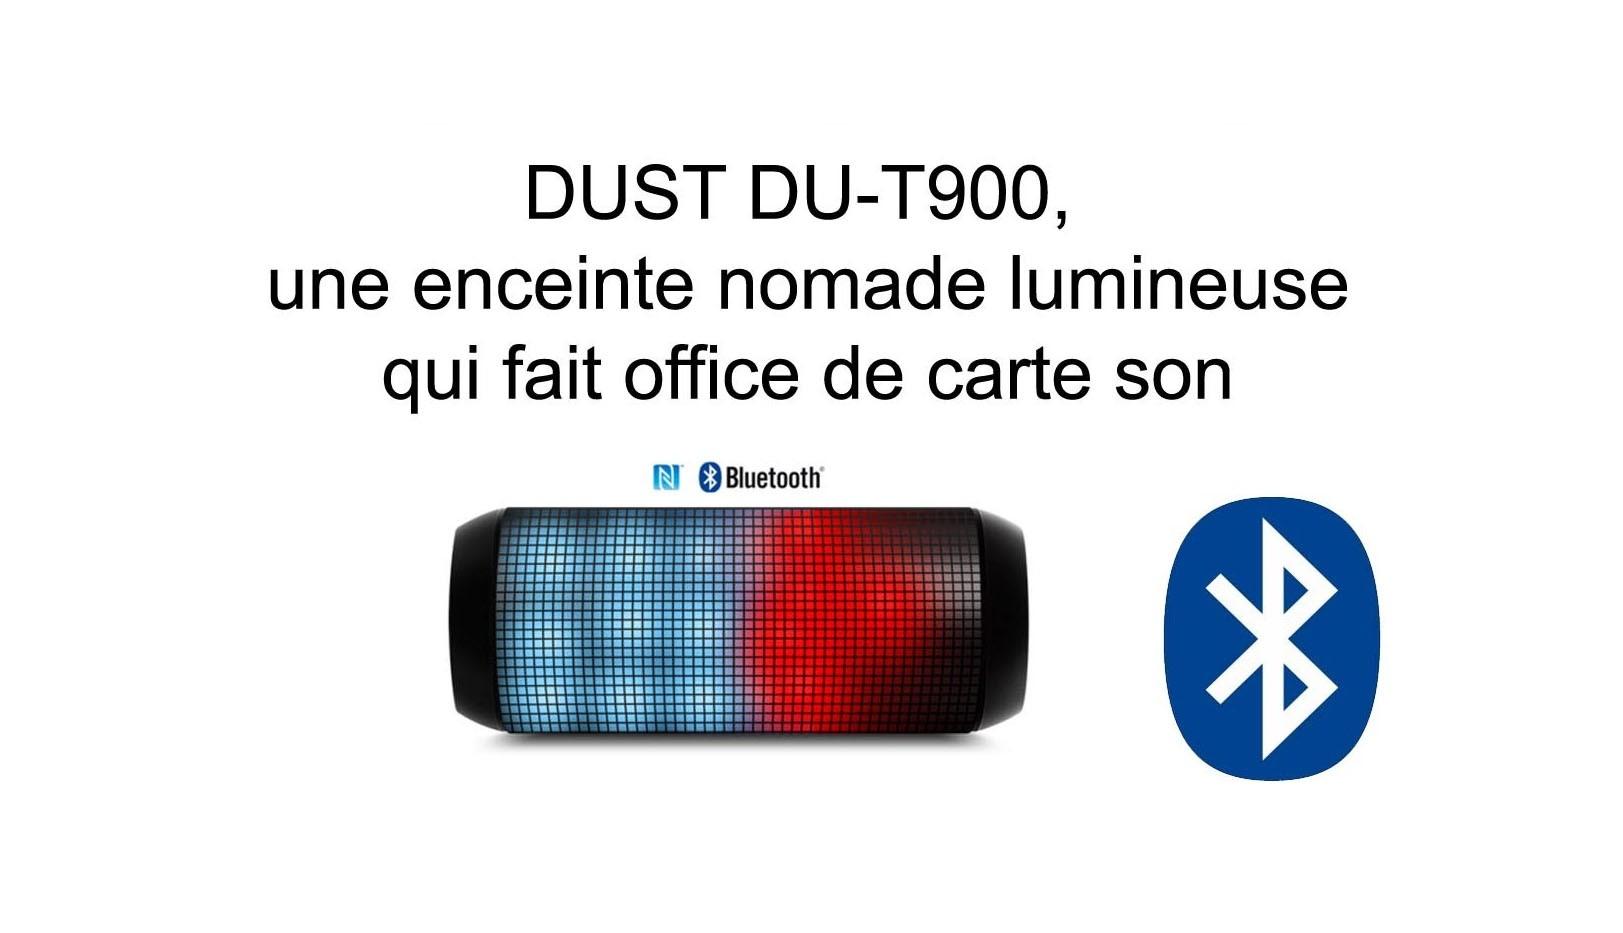 Enceinte DUST DU-T900